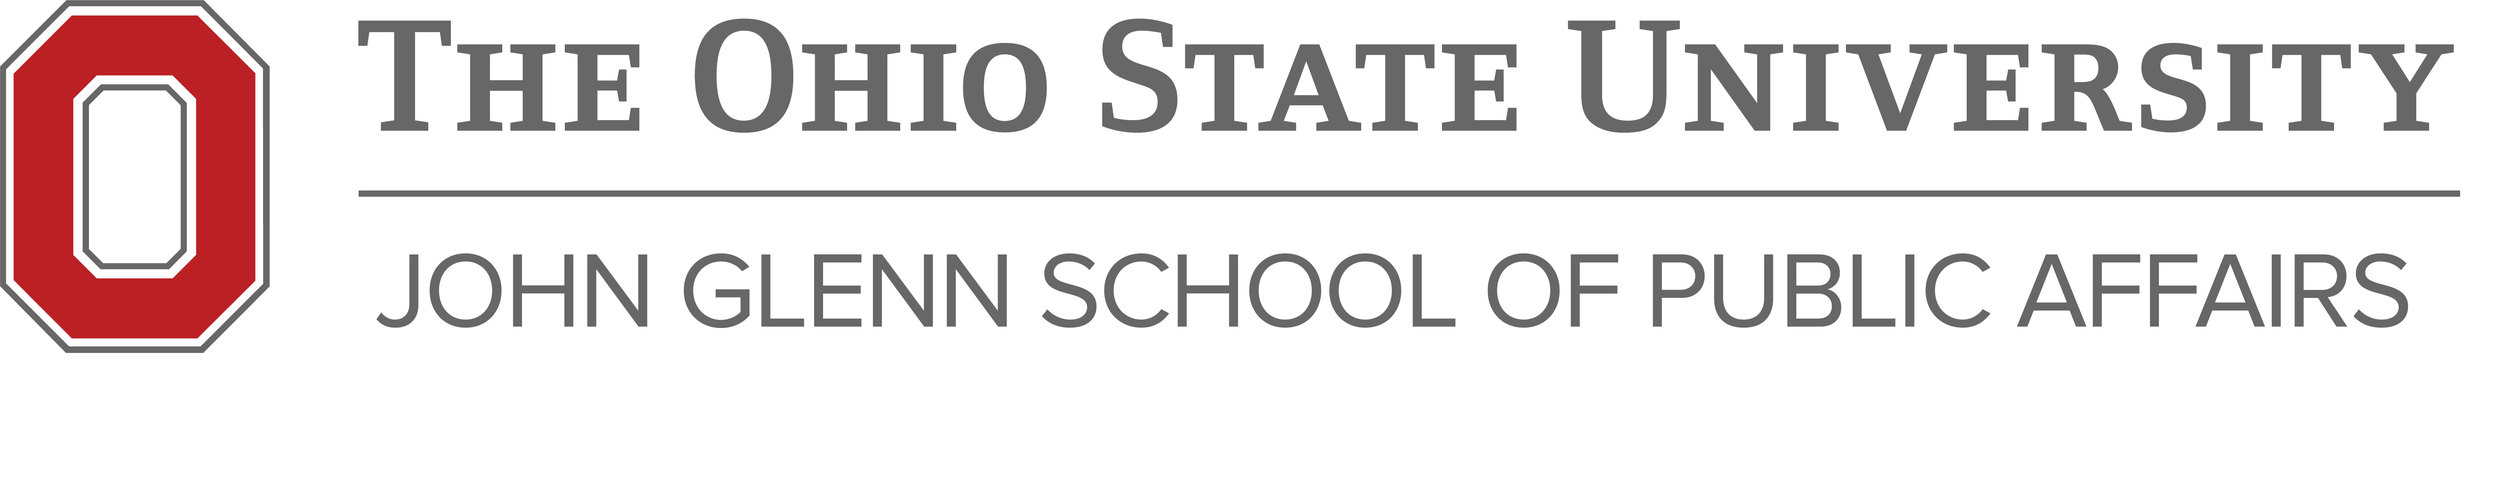 John Glenn School of Public Affairs.jpg